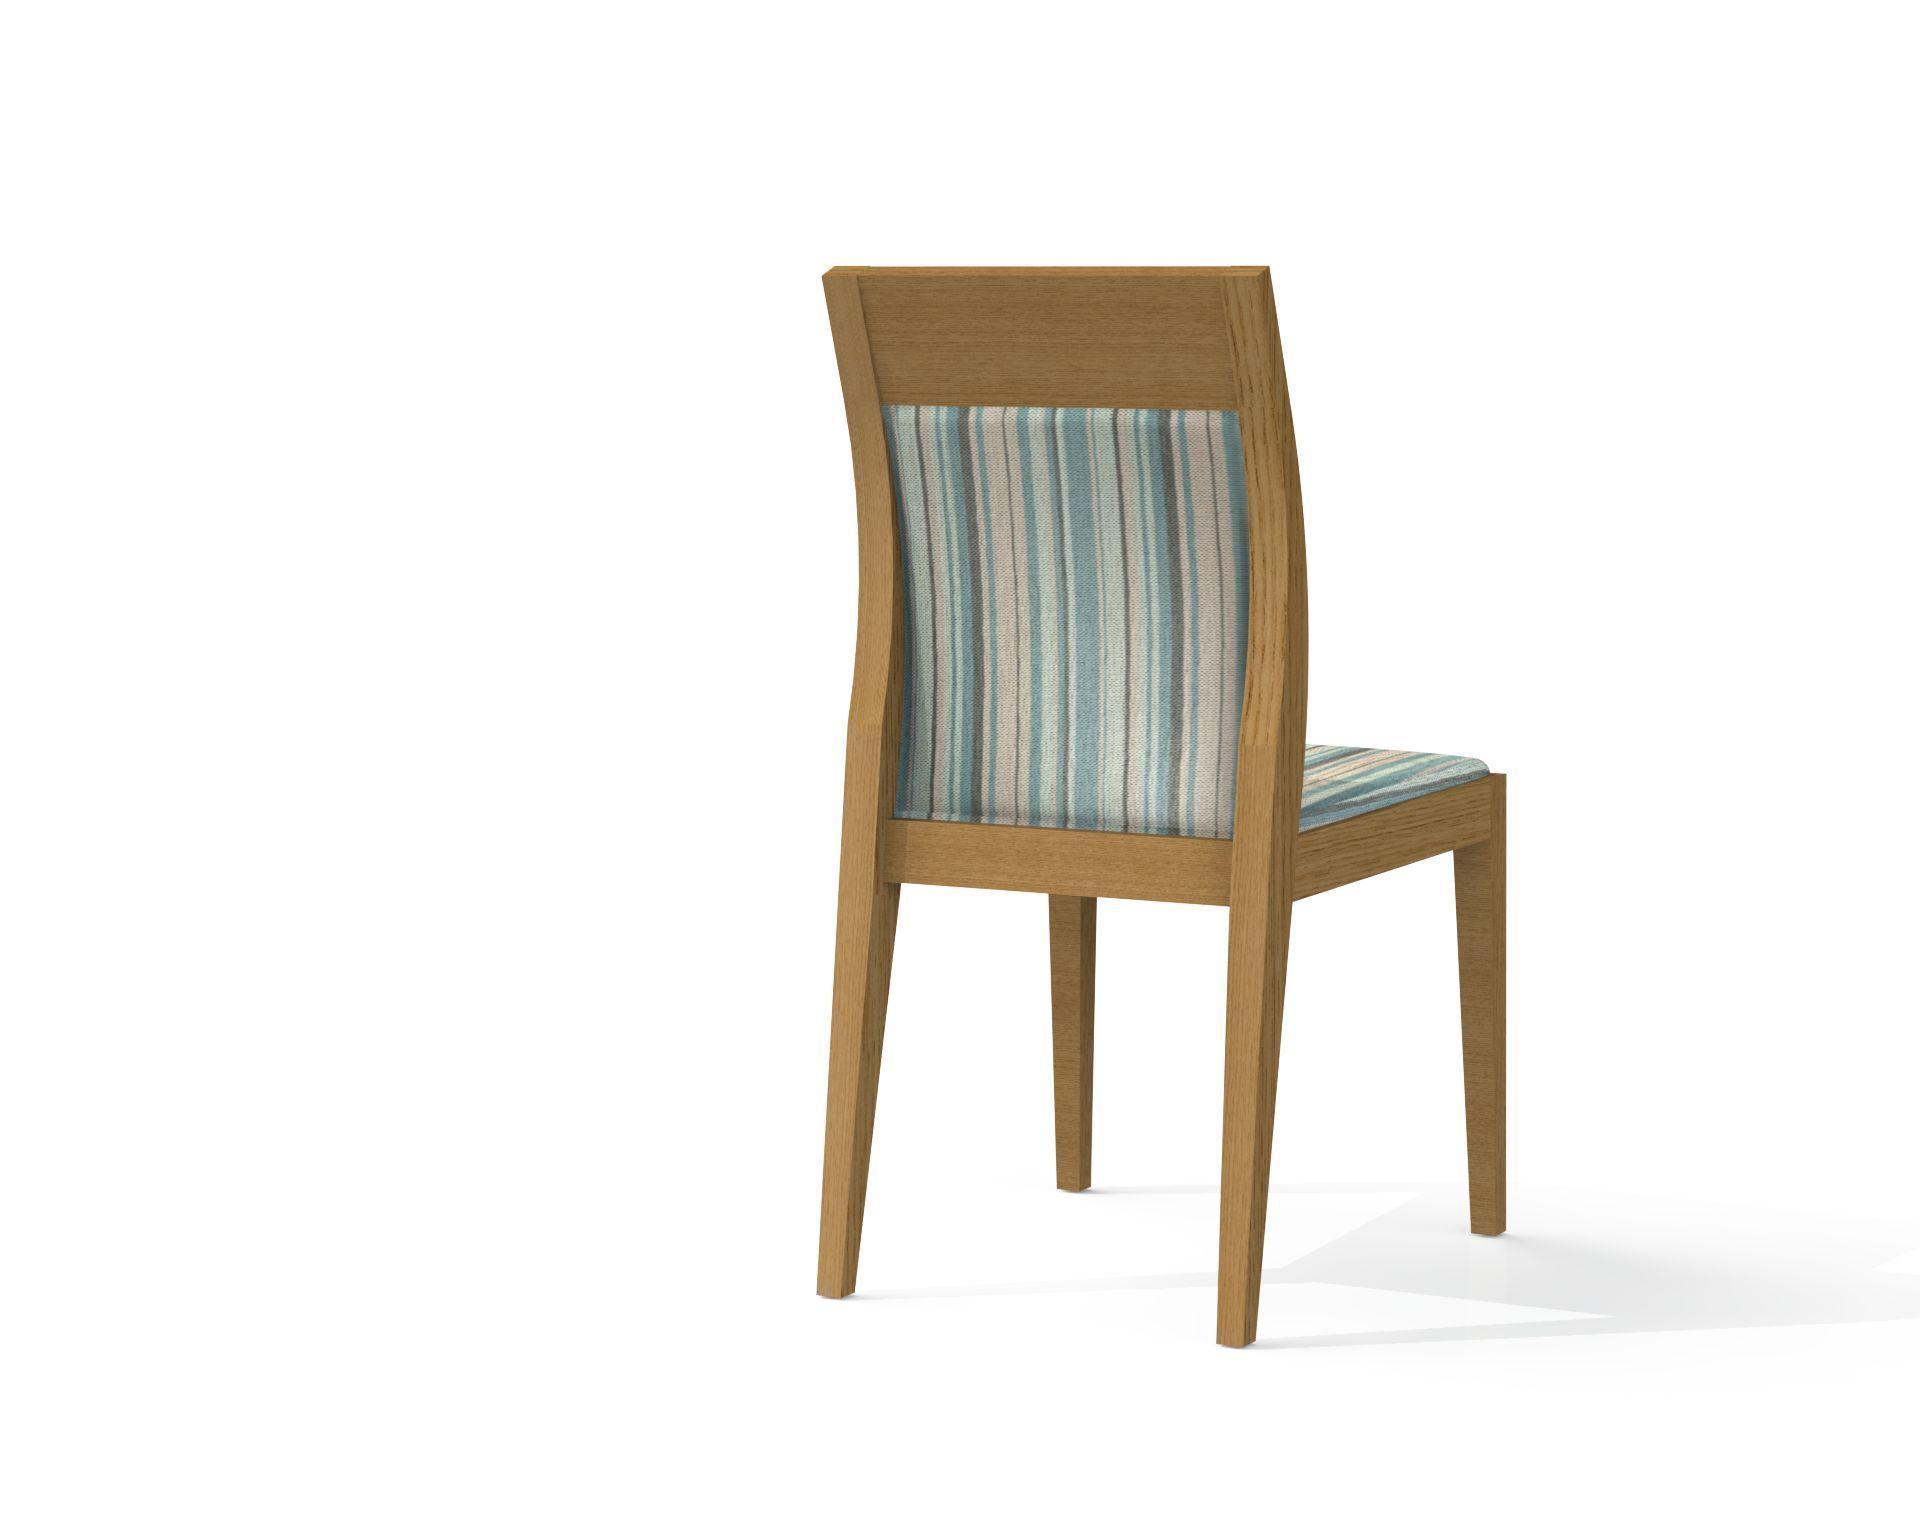 Designed chair free 3d model for New model chair design